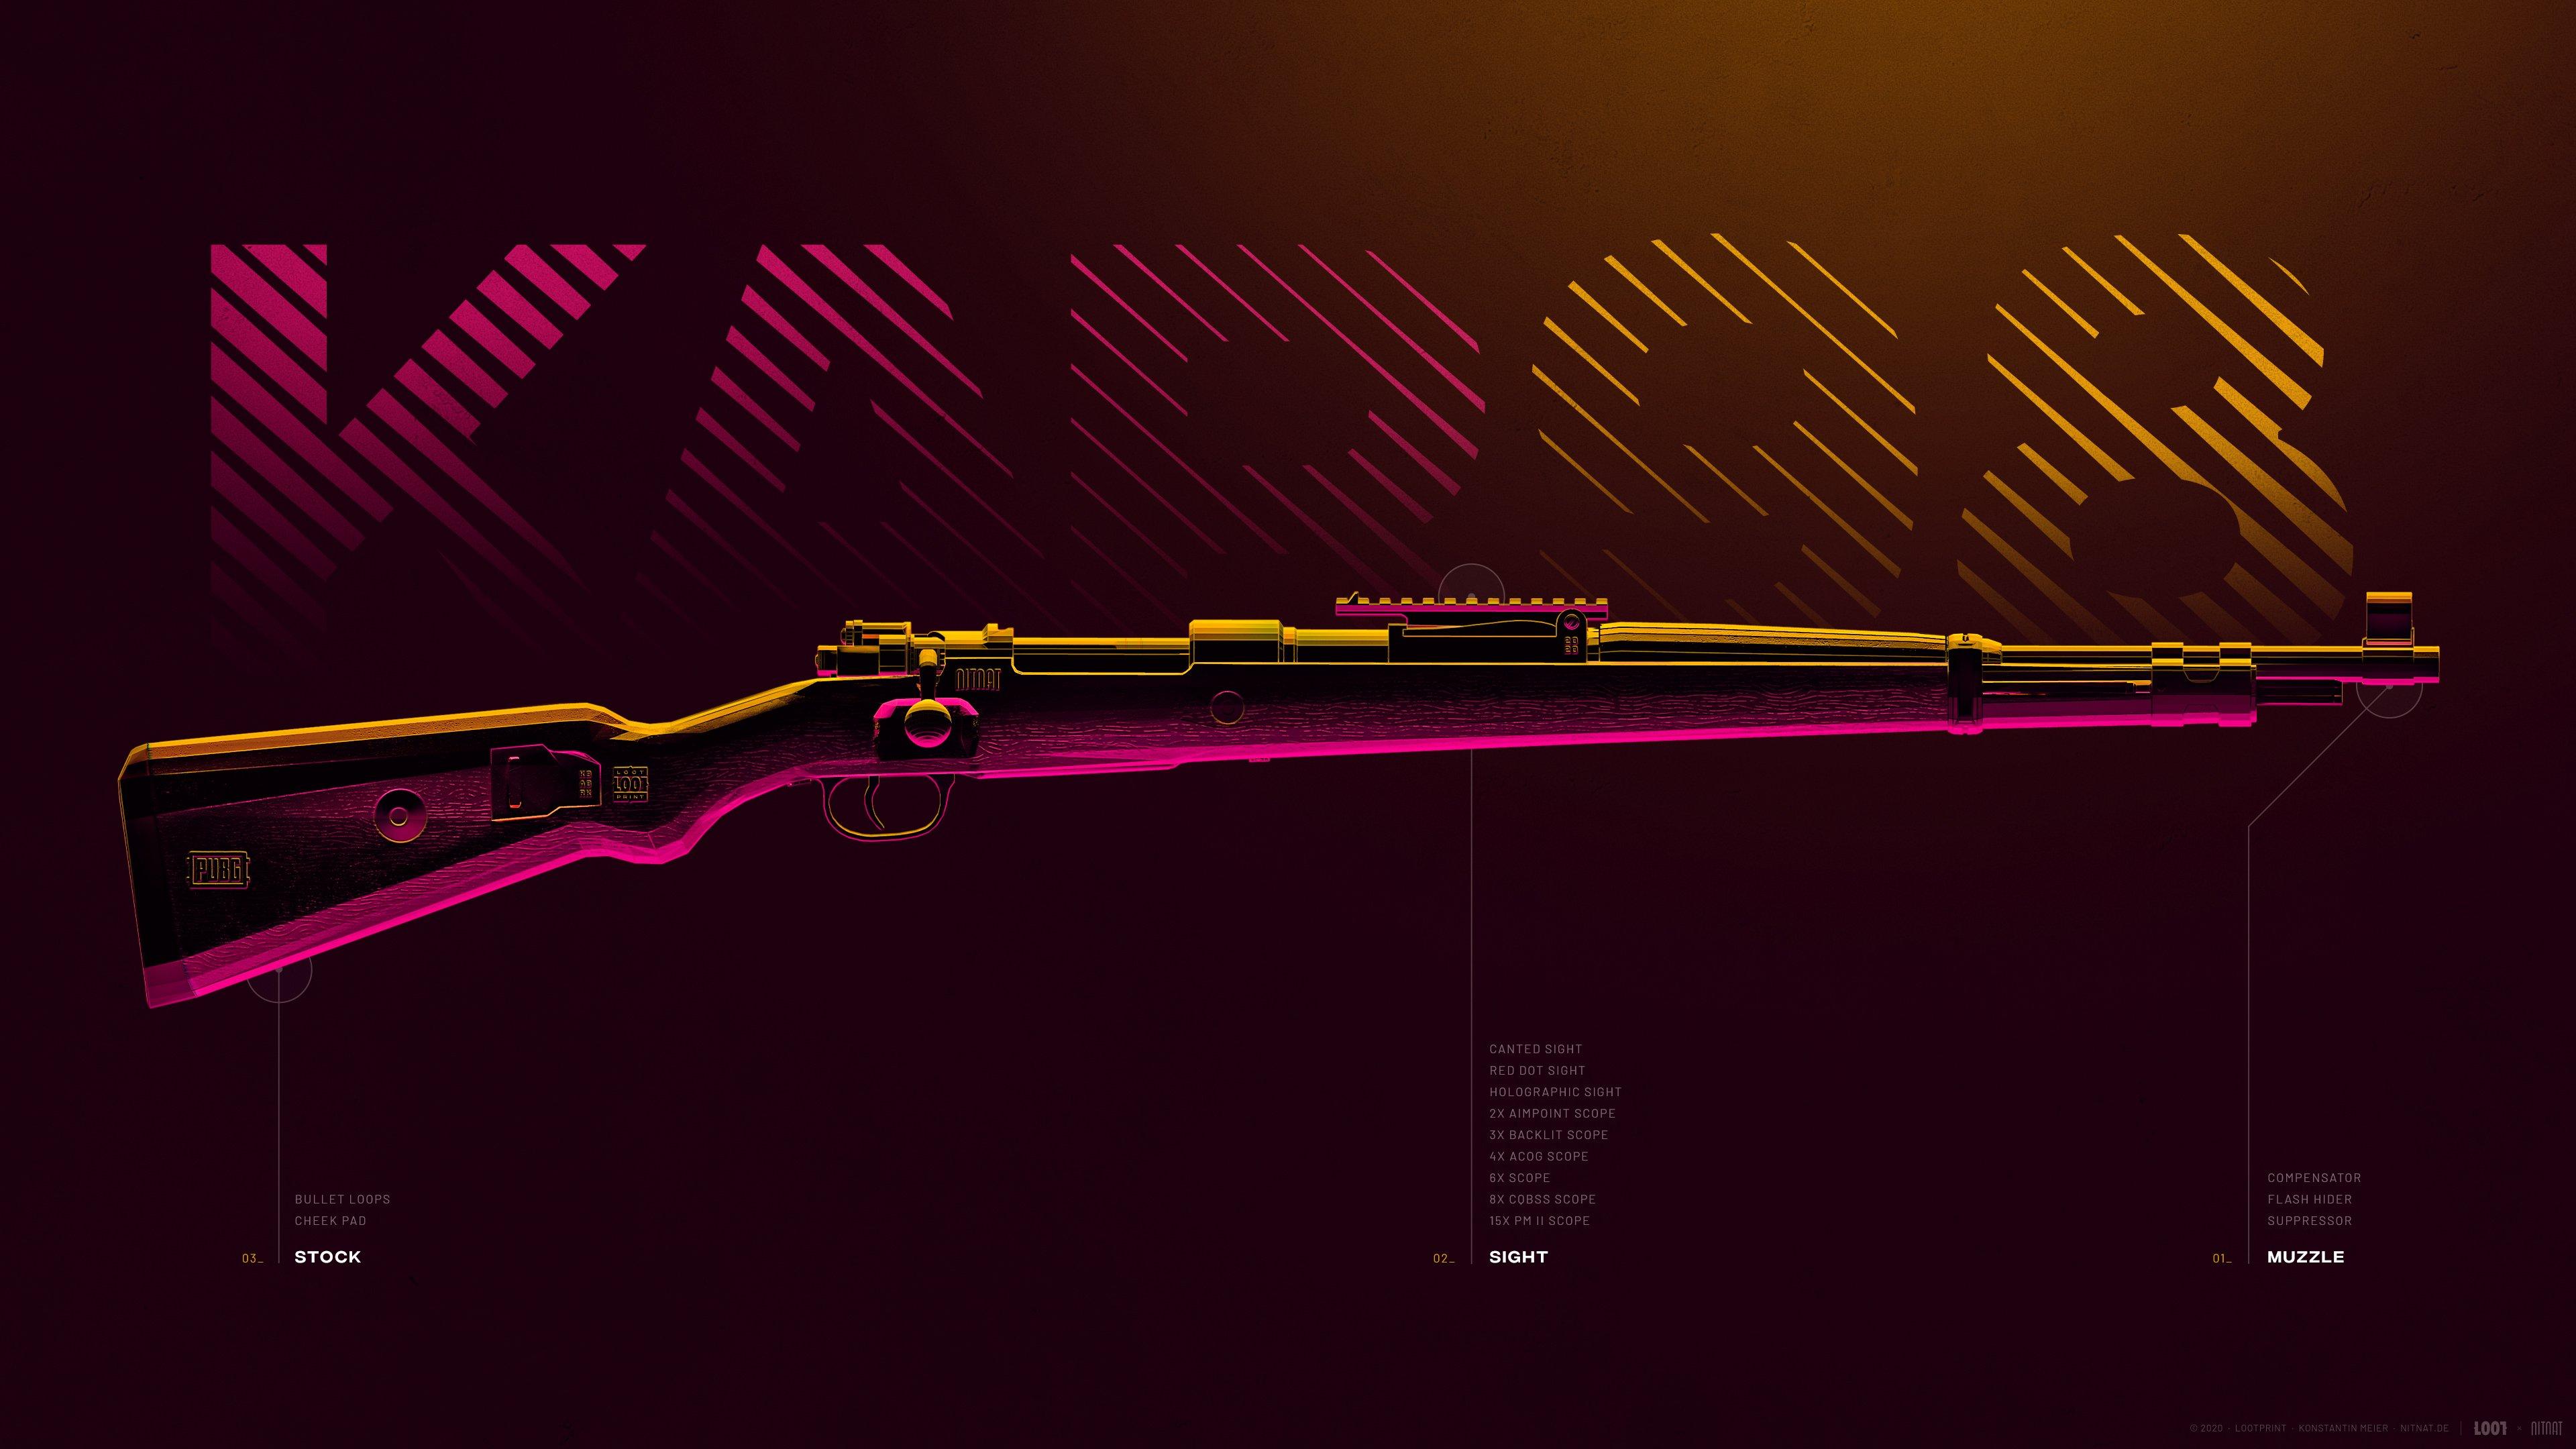 Fondos de pantalla Arma KAR98 de PUBG